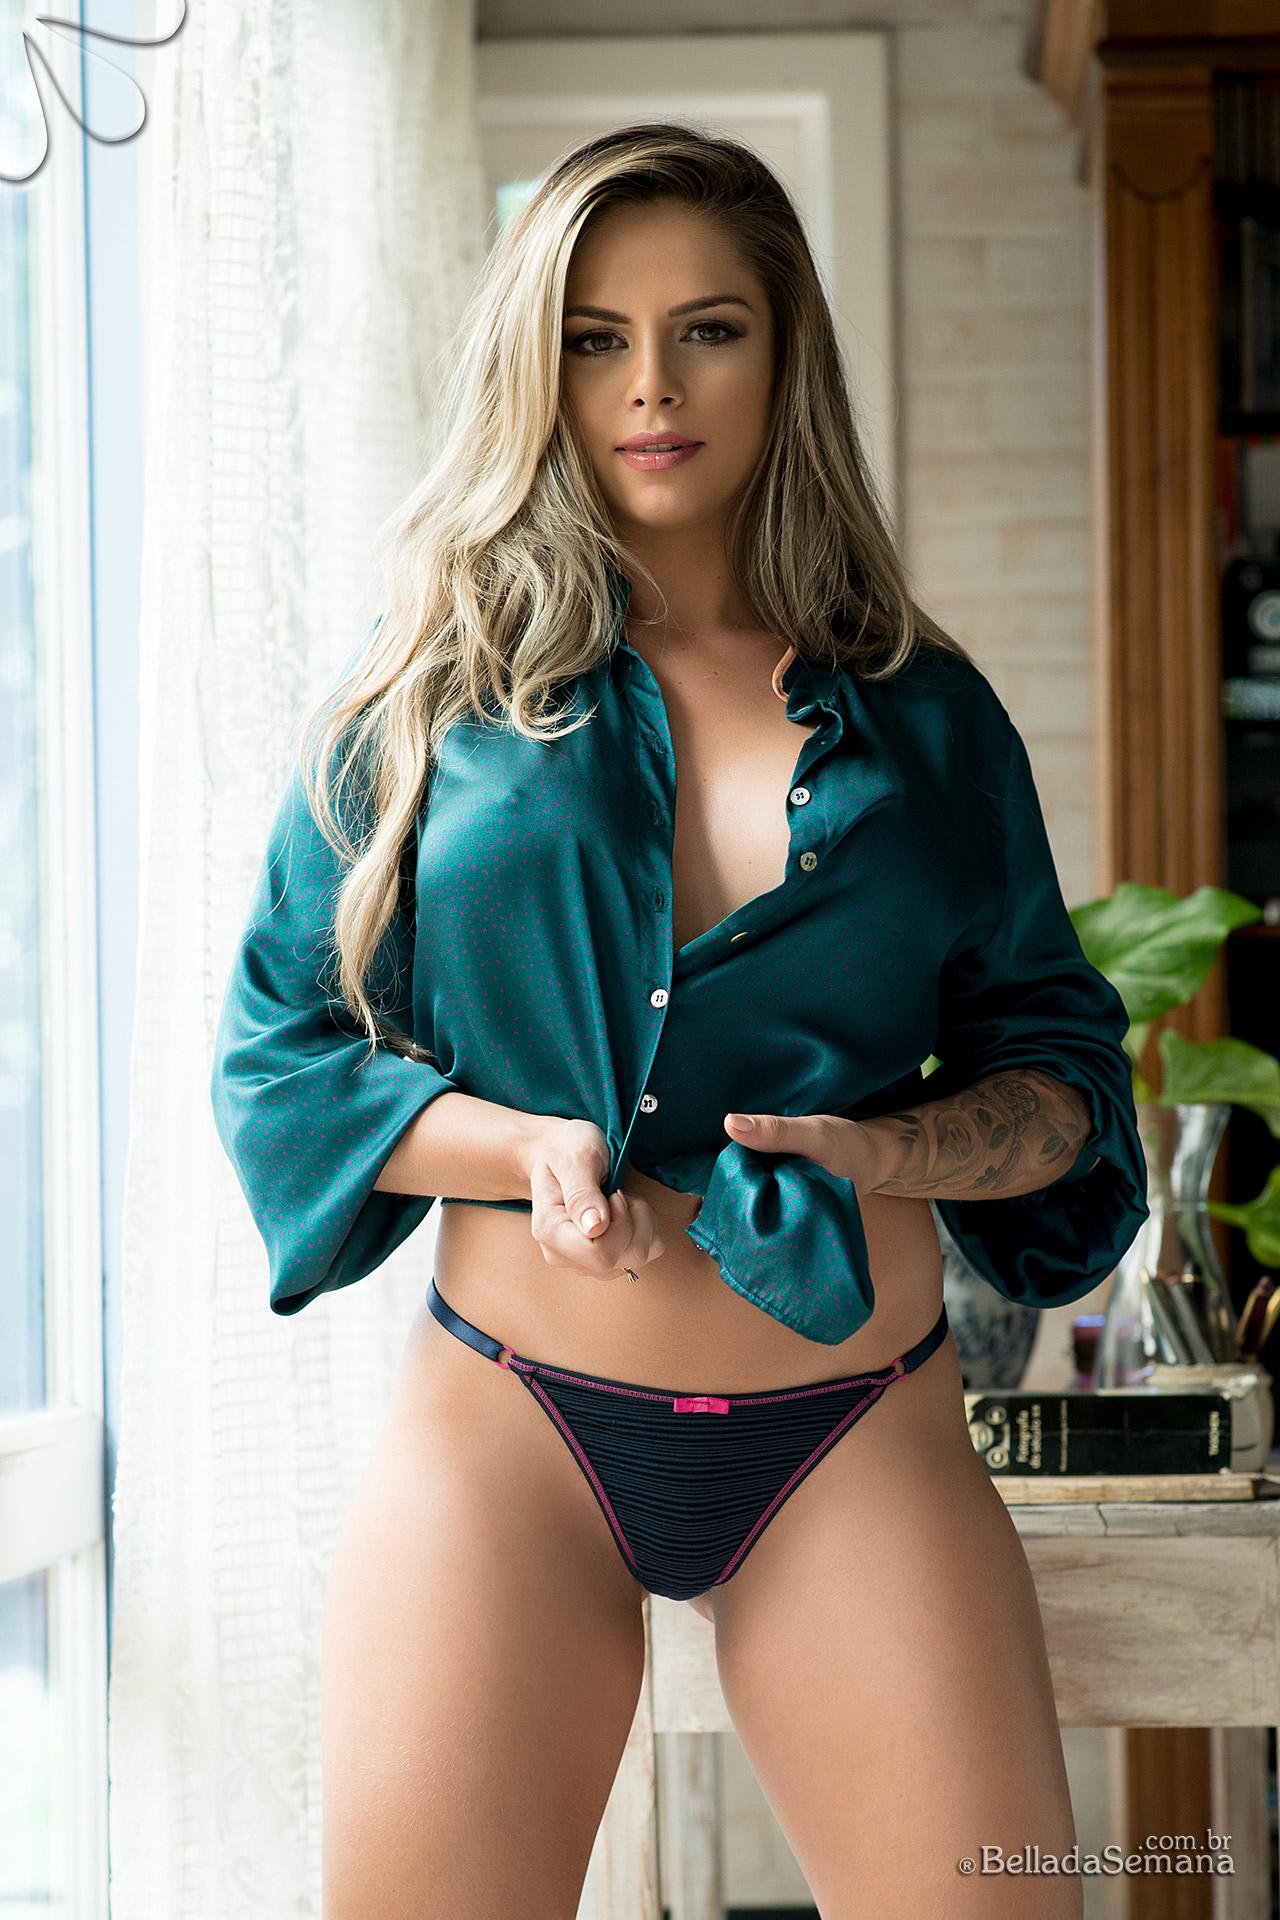 Musa gaúcha, Stefanie Mello